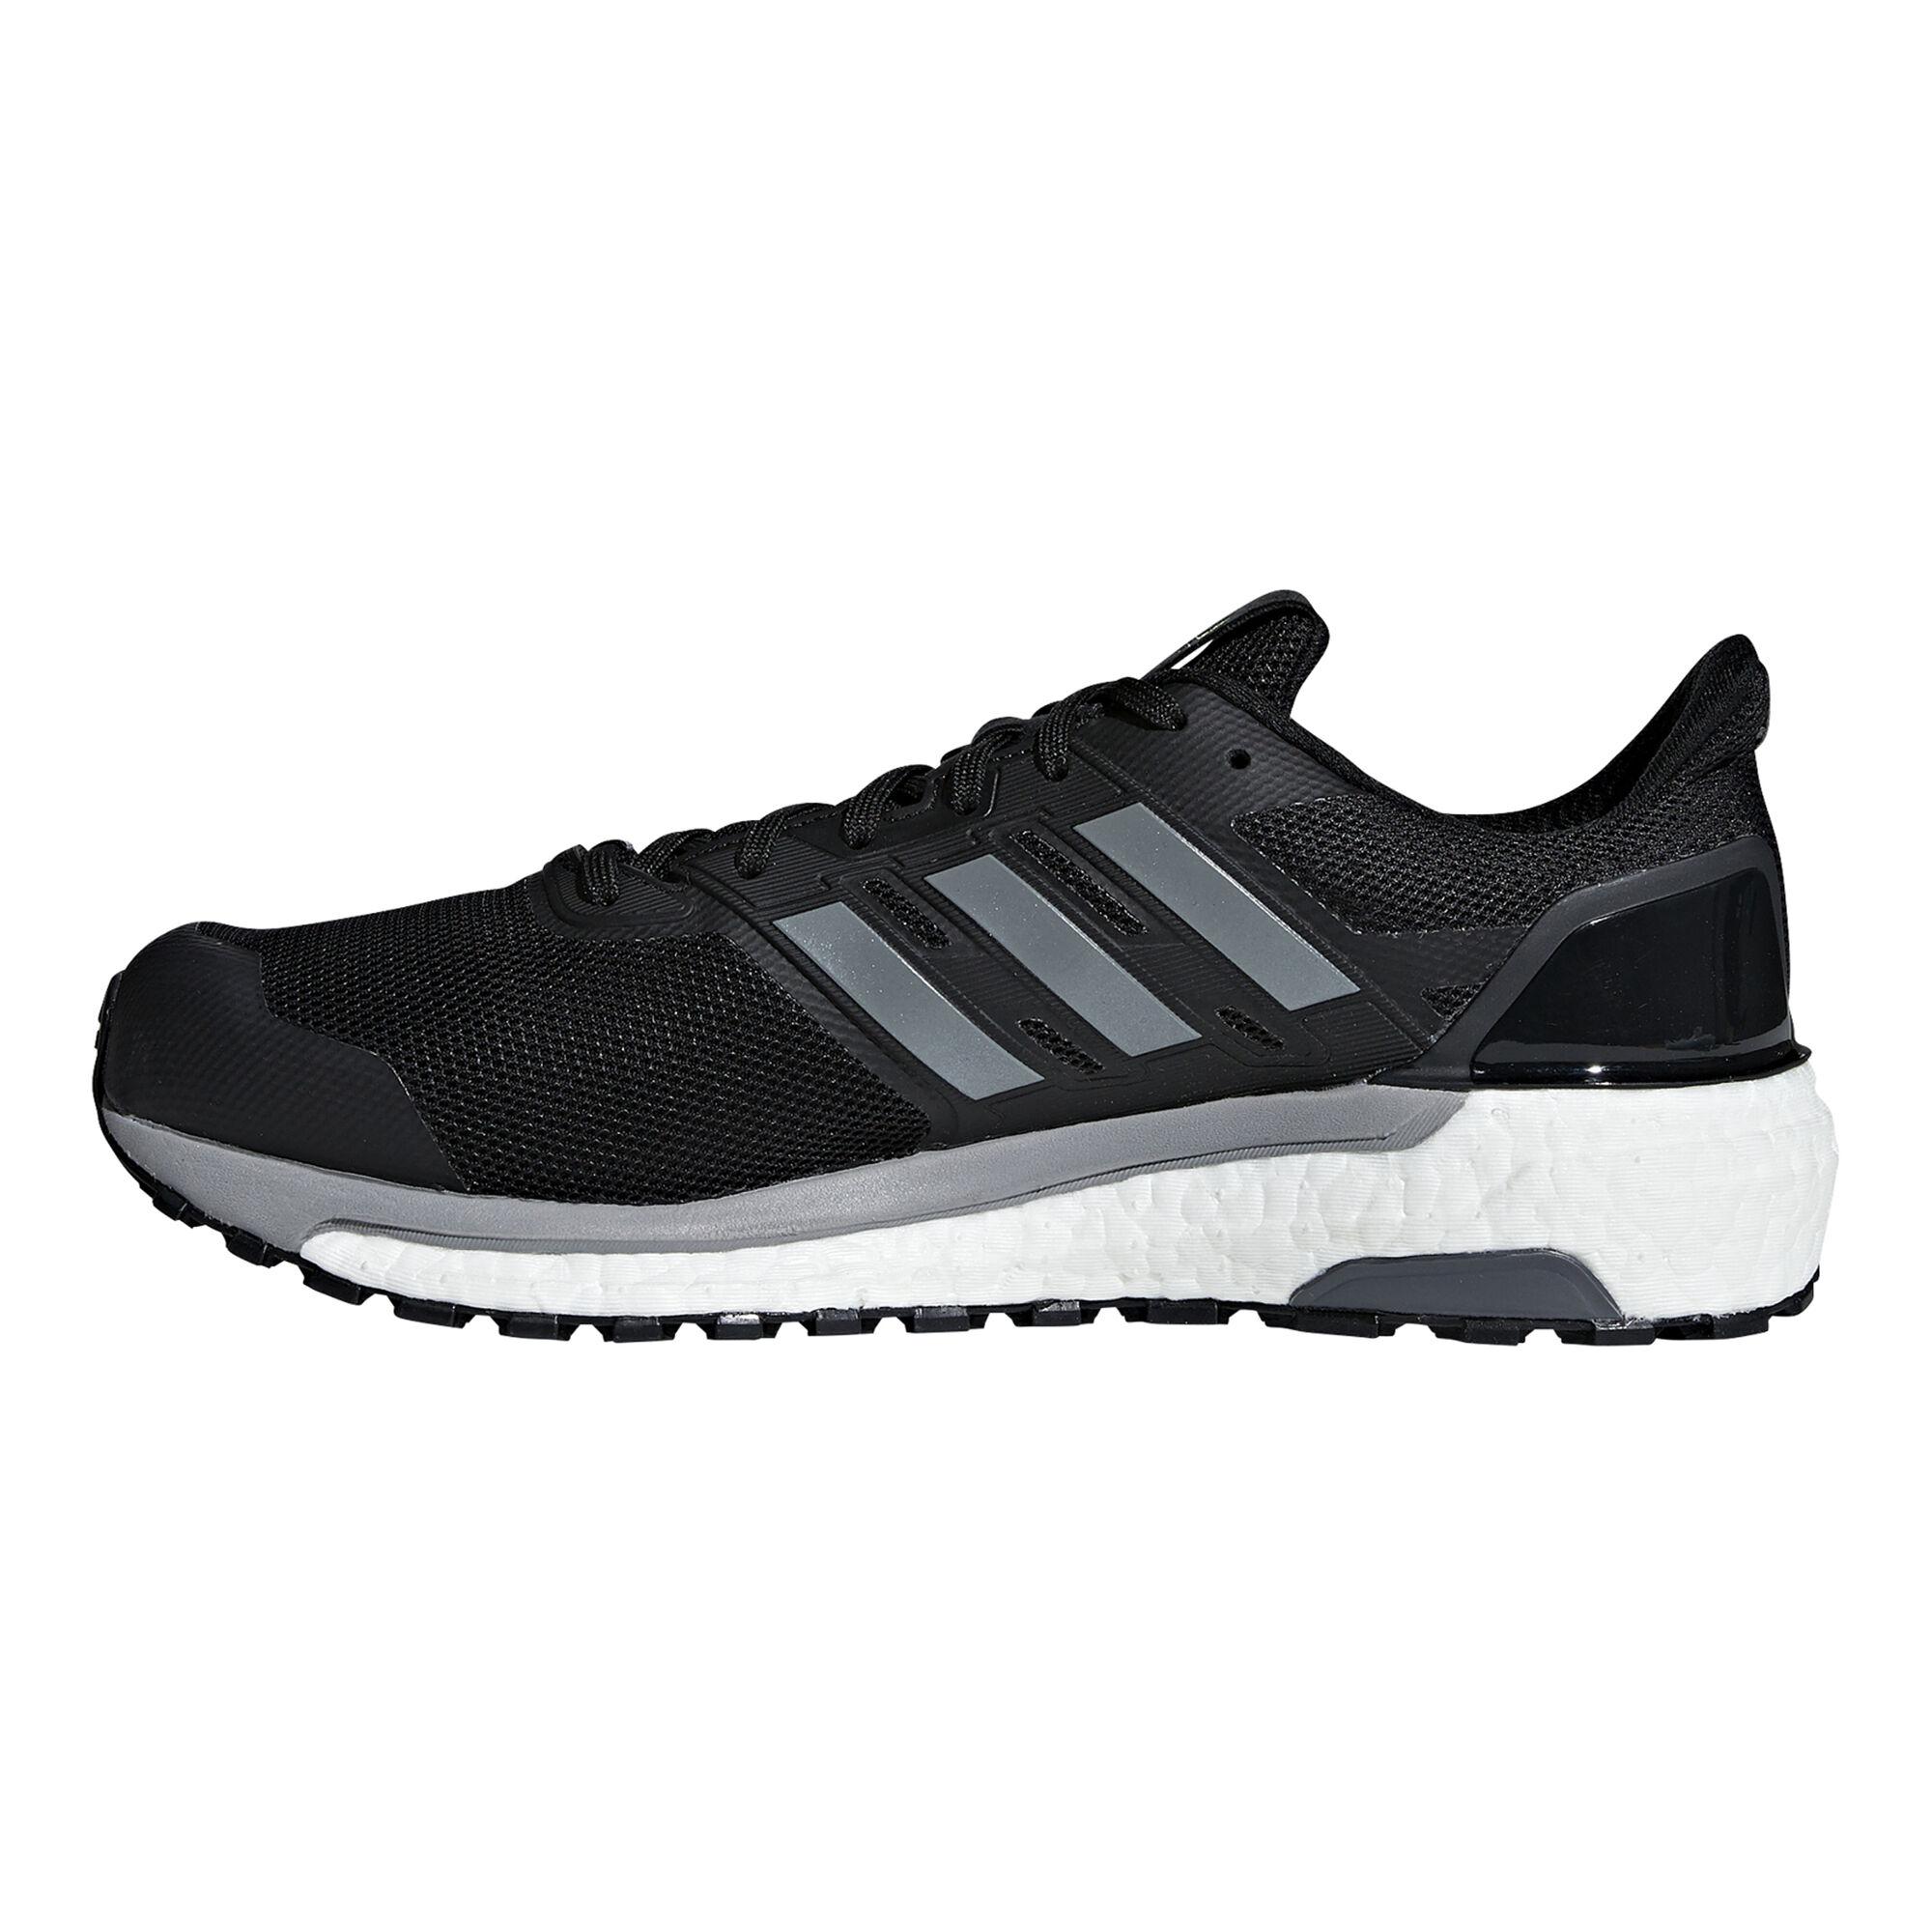 low priced 92d57 c80a1 adidas · adidas · adidas · adidas ...